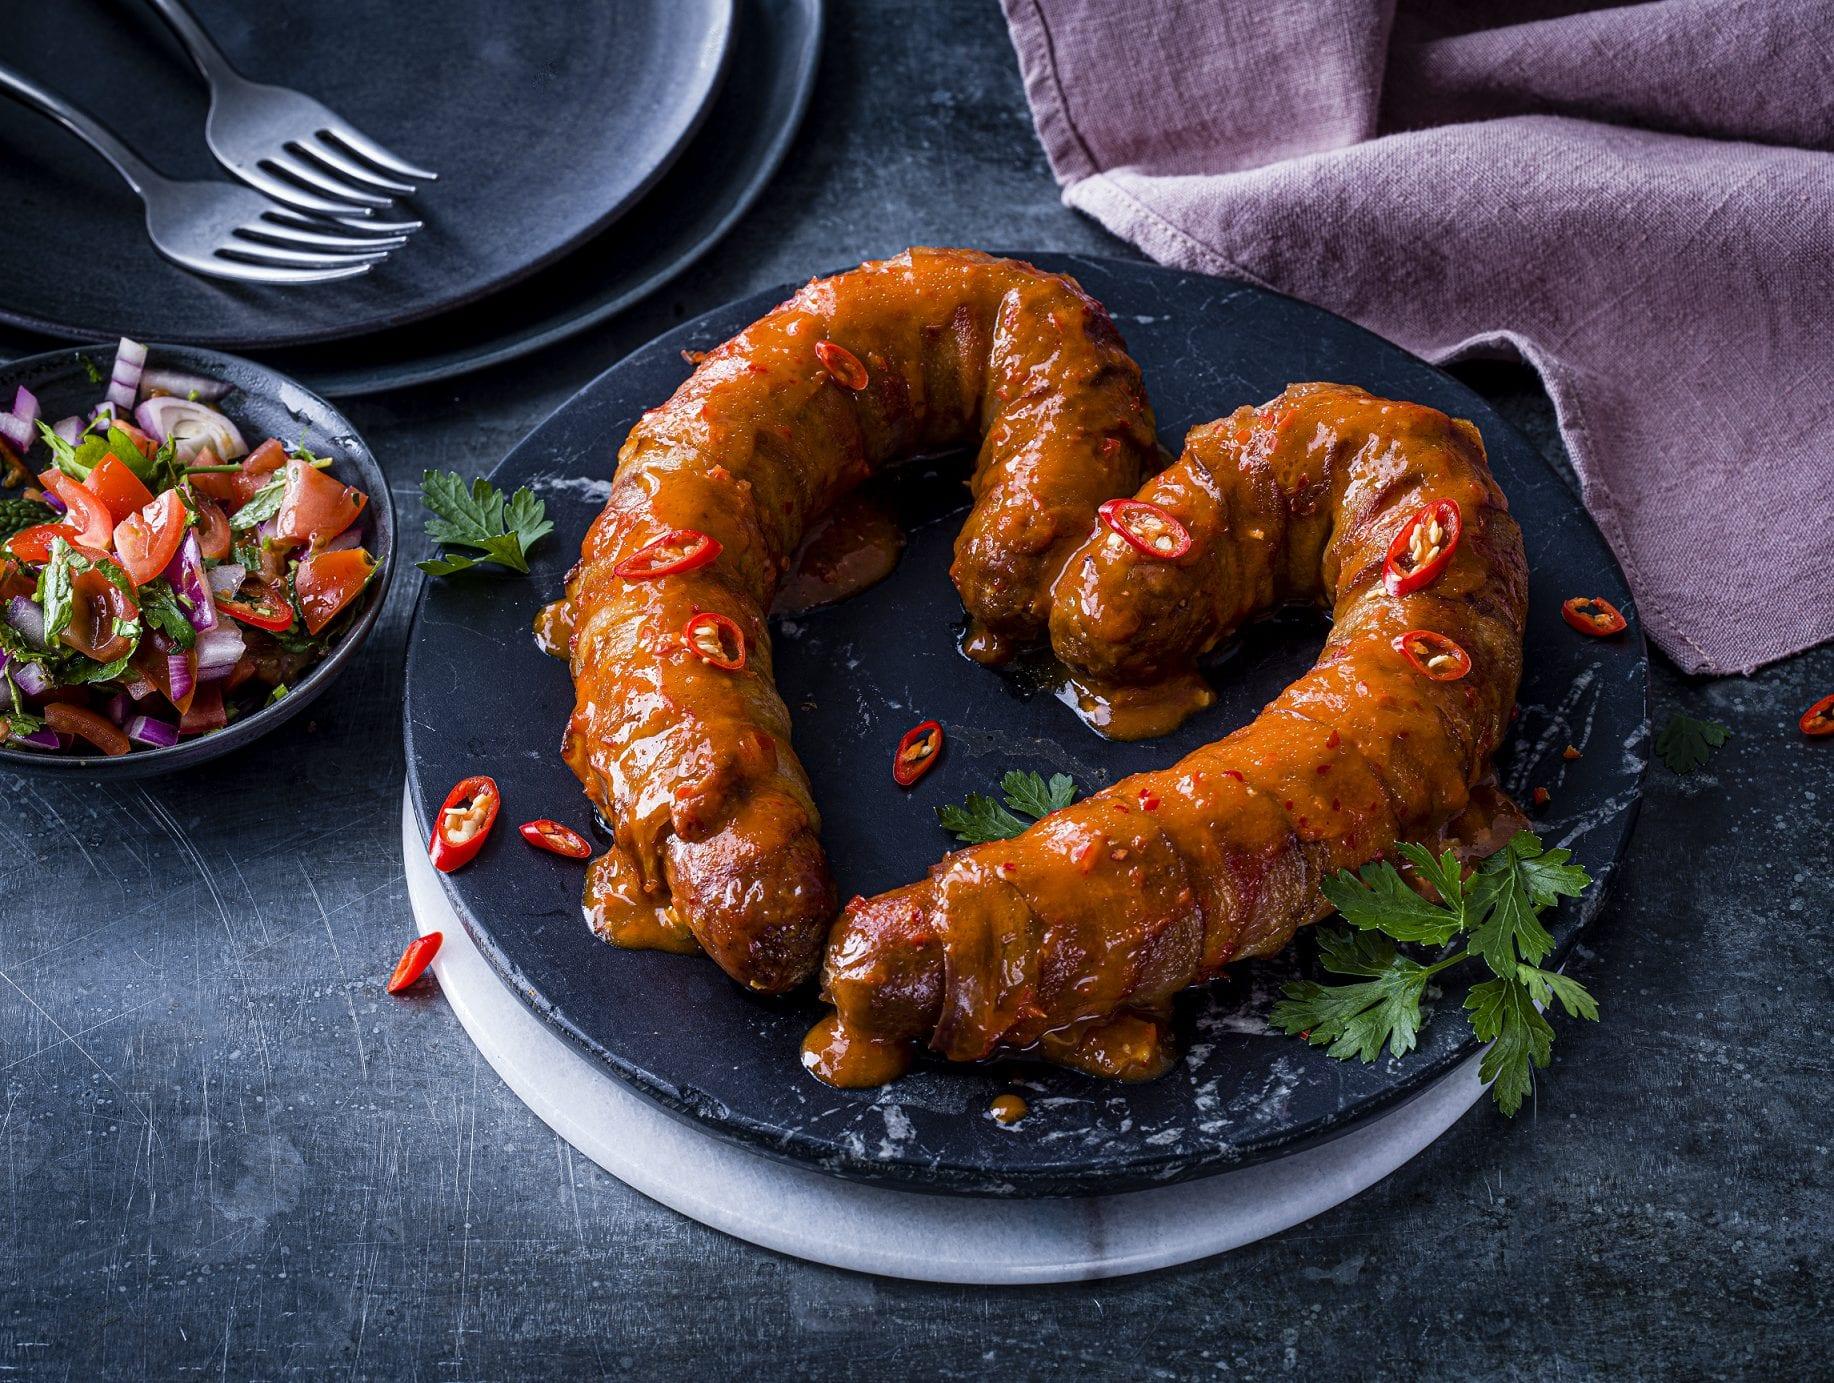 M&S Love Sausage